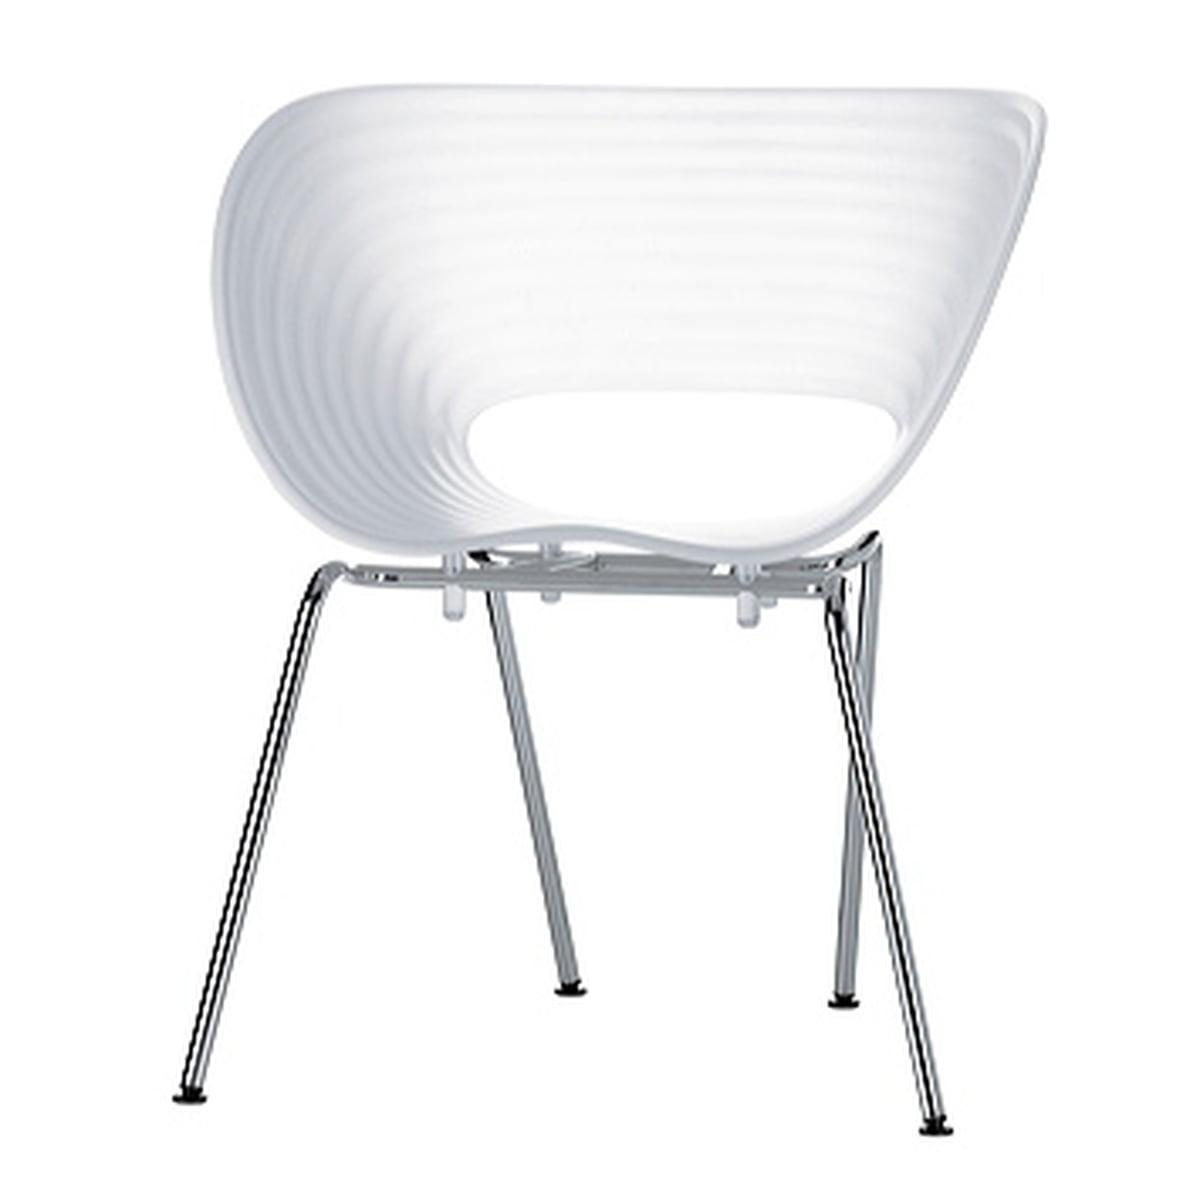 Vip Stoelen 50 Shades Of Grey.Vitra Tom Vac Chrome Plated White Plastic Pads